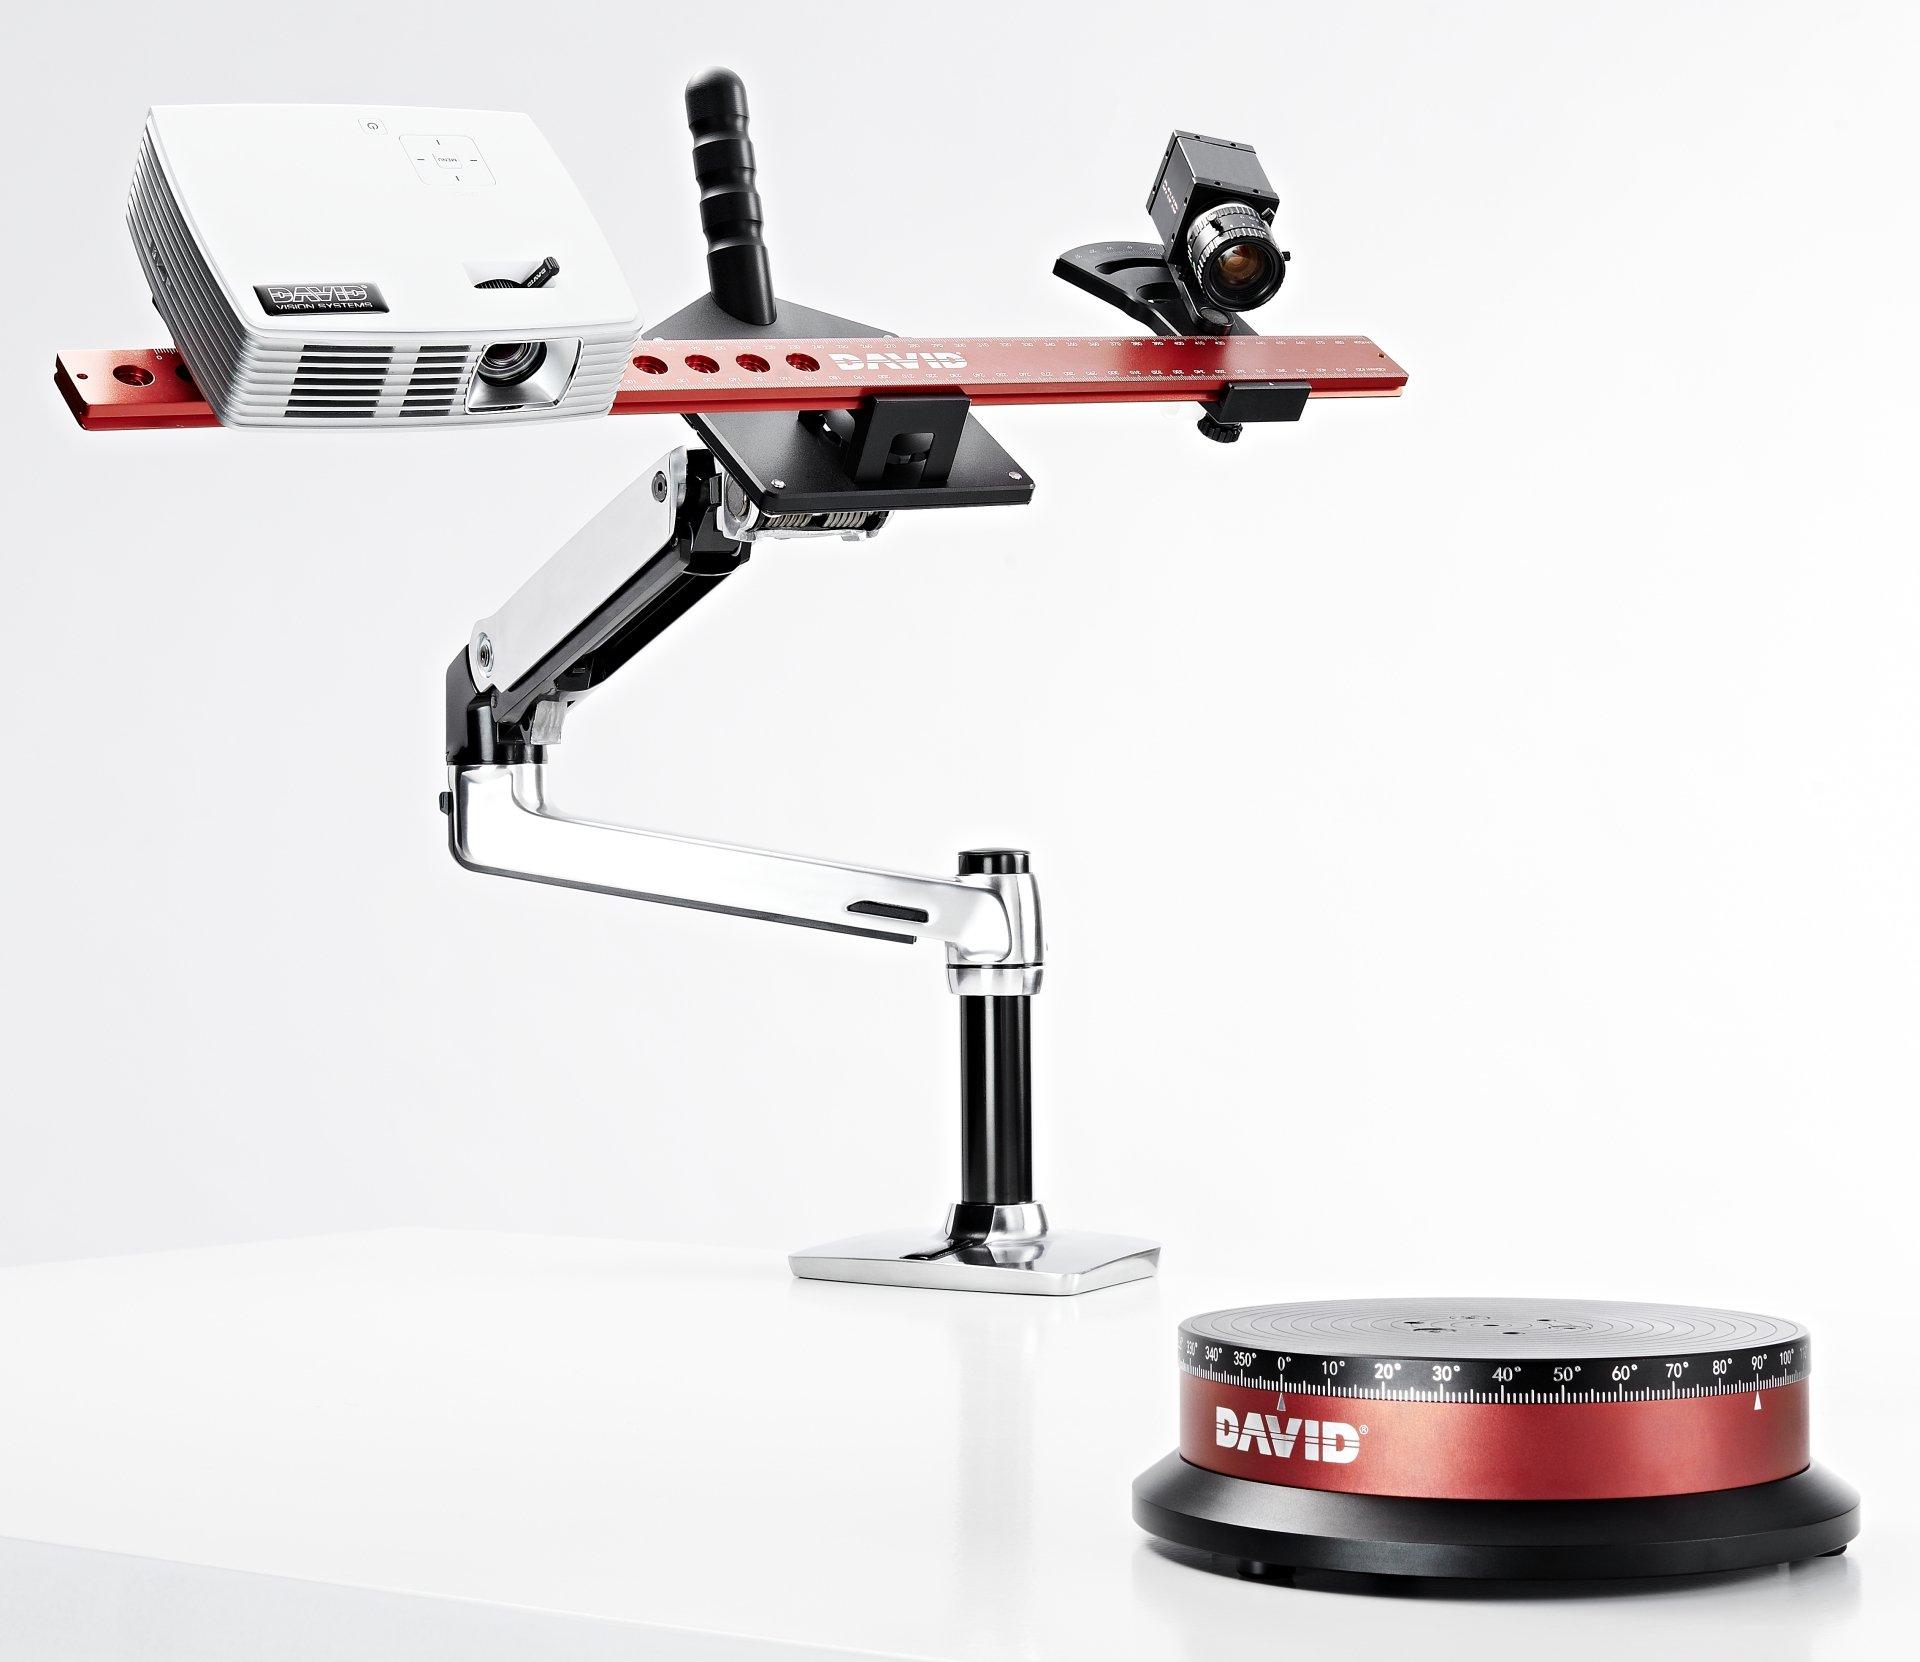 DAVID Vision Systems Bundle SLS-3 3D Scanner, TT-1 Automatic Turntable and DSL-1 Desk Scan Lever